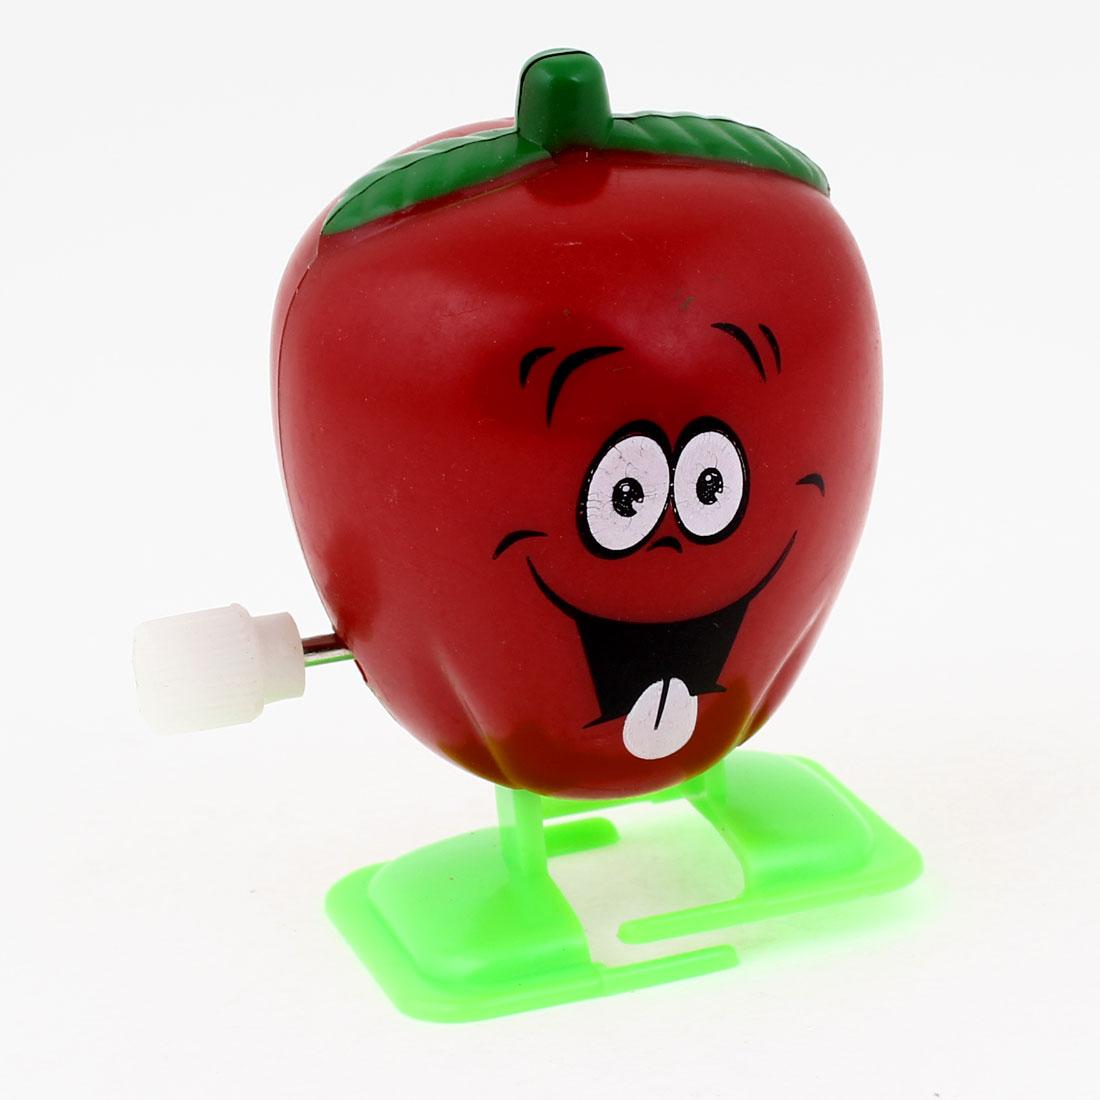 Children Kids Gift Red Apple Shape Plastic Artificial Walking Clockwork Toy